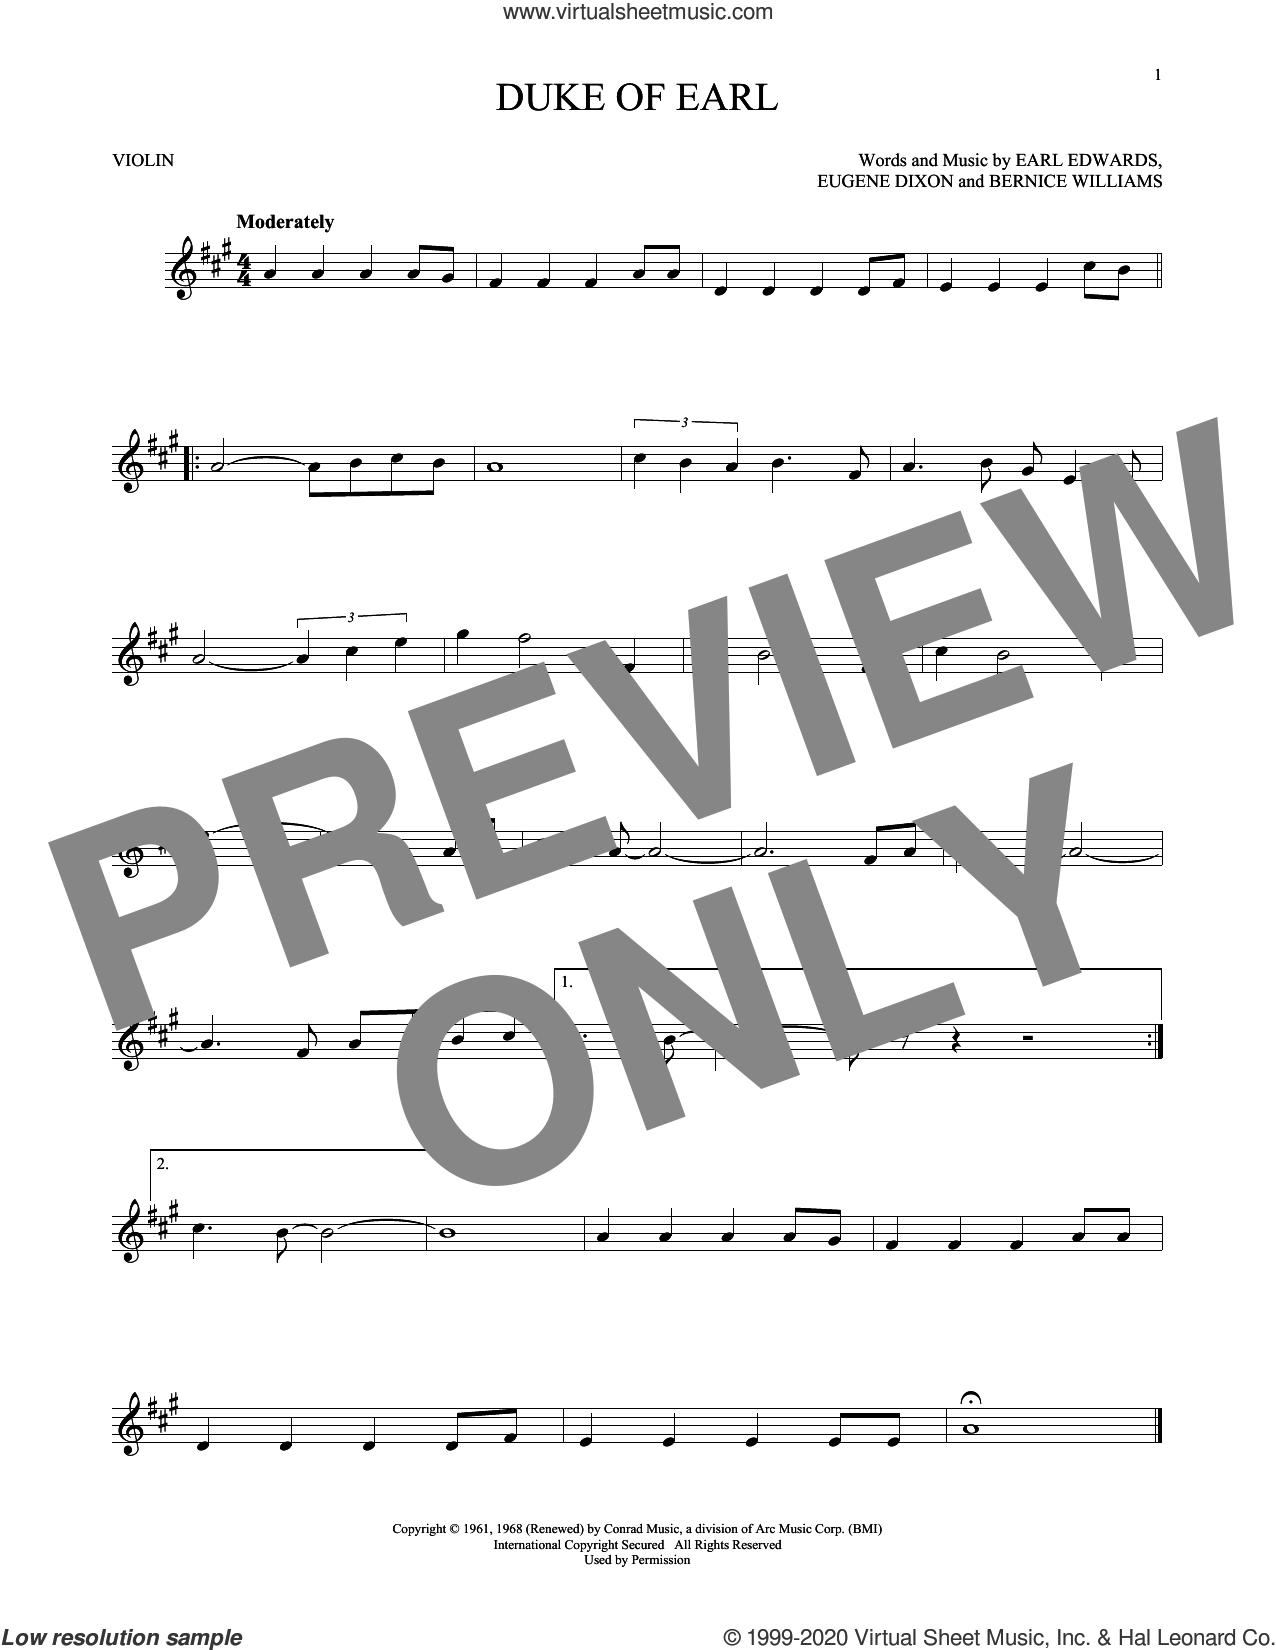 Duke Of Earl sheet music for violin solo by Gene Chandler, Bernice Williams, Earl Edwards and Eugene Dixon, intermediate skill level